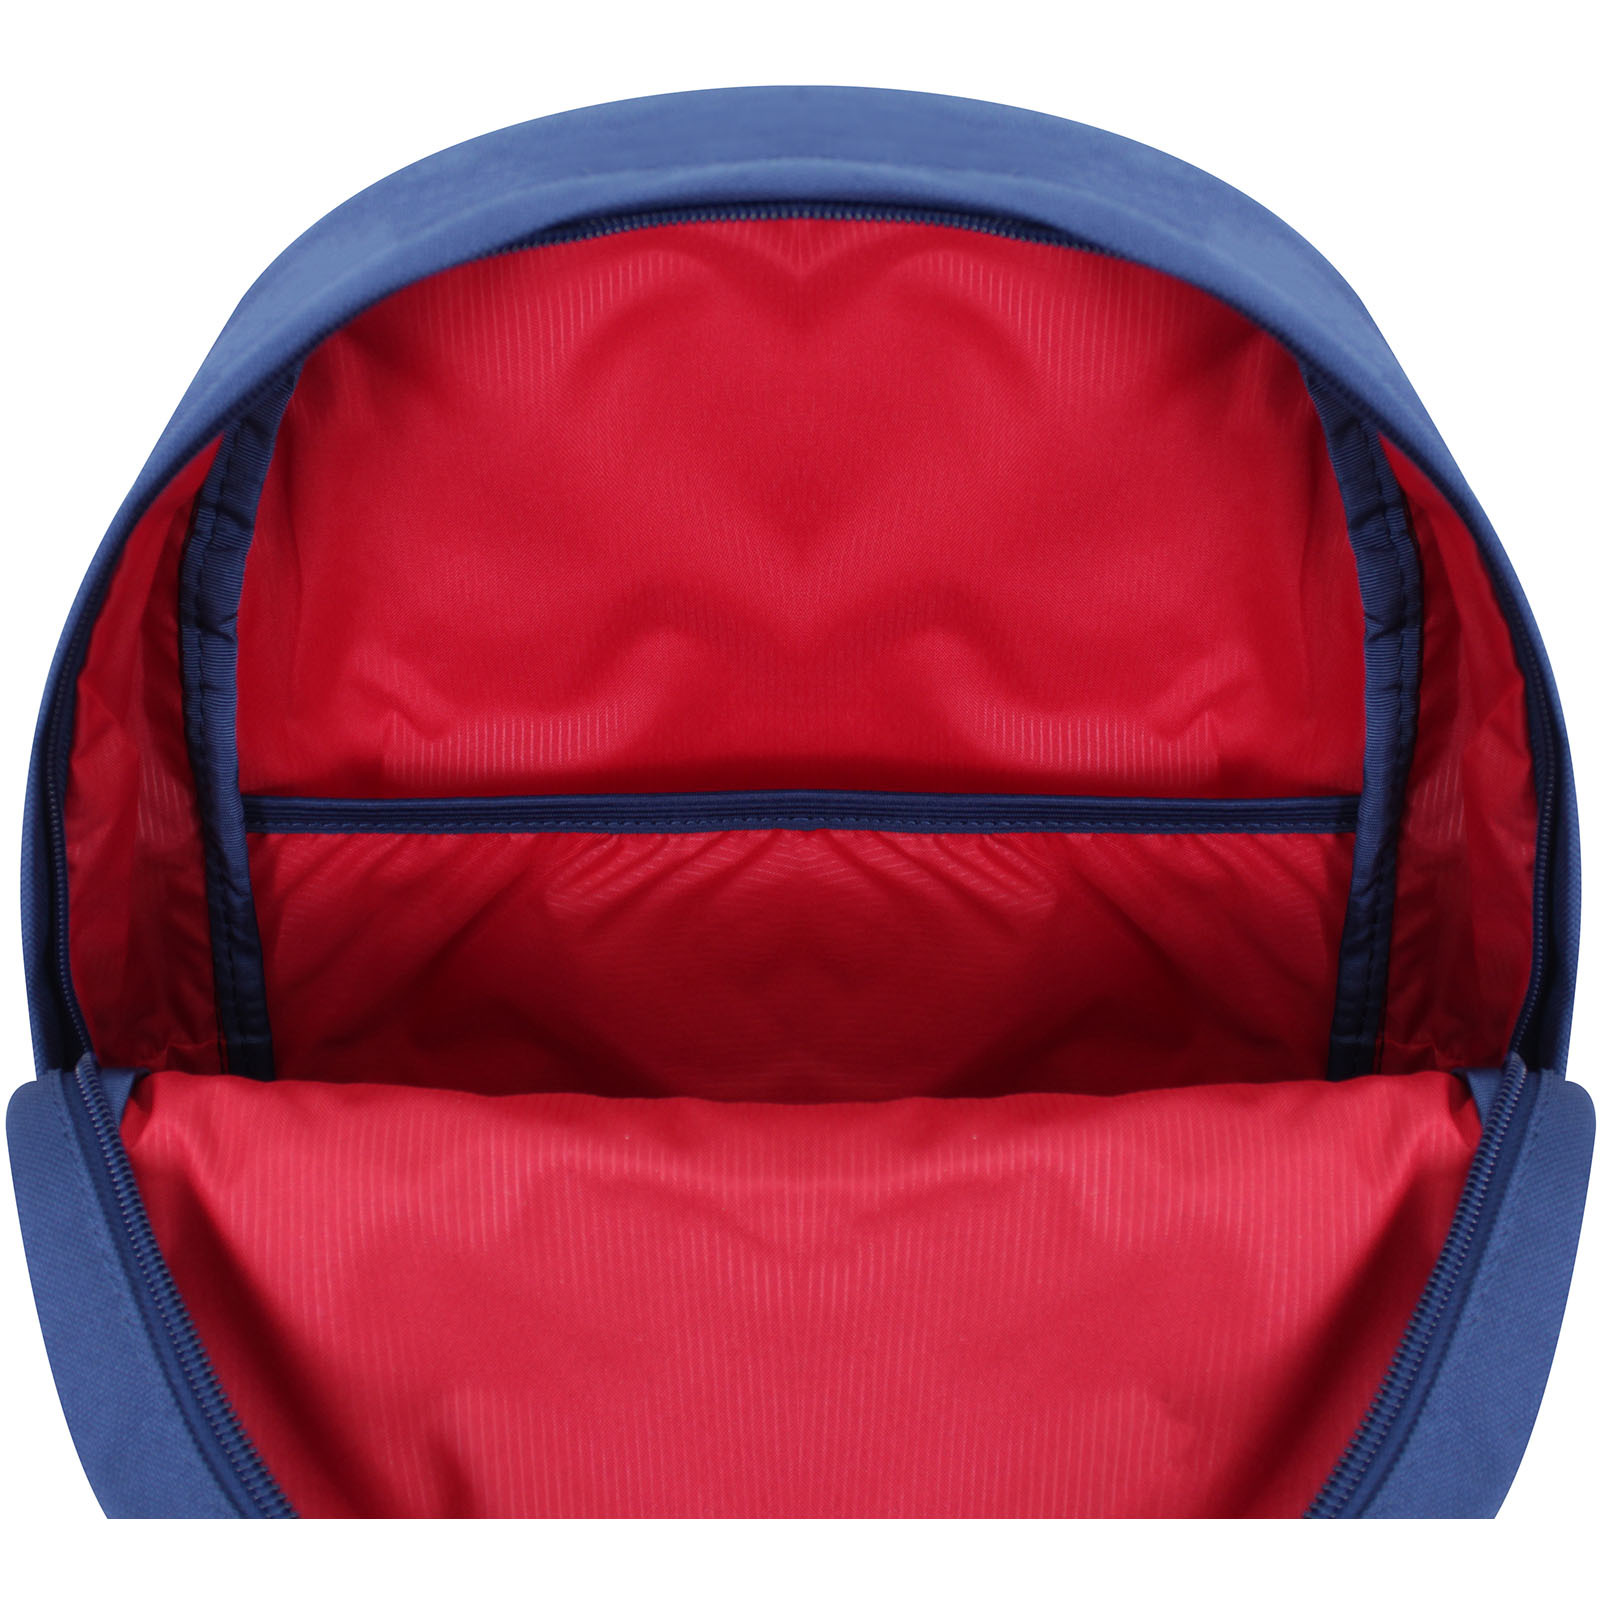 Рюкзак Bagland Молодежный W/R 17 л. Синий 181 (00533662) фото 4